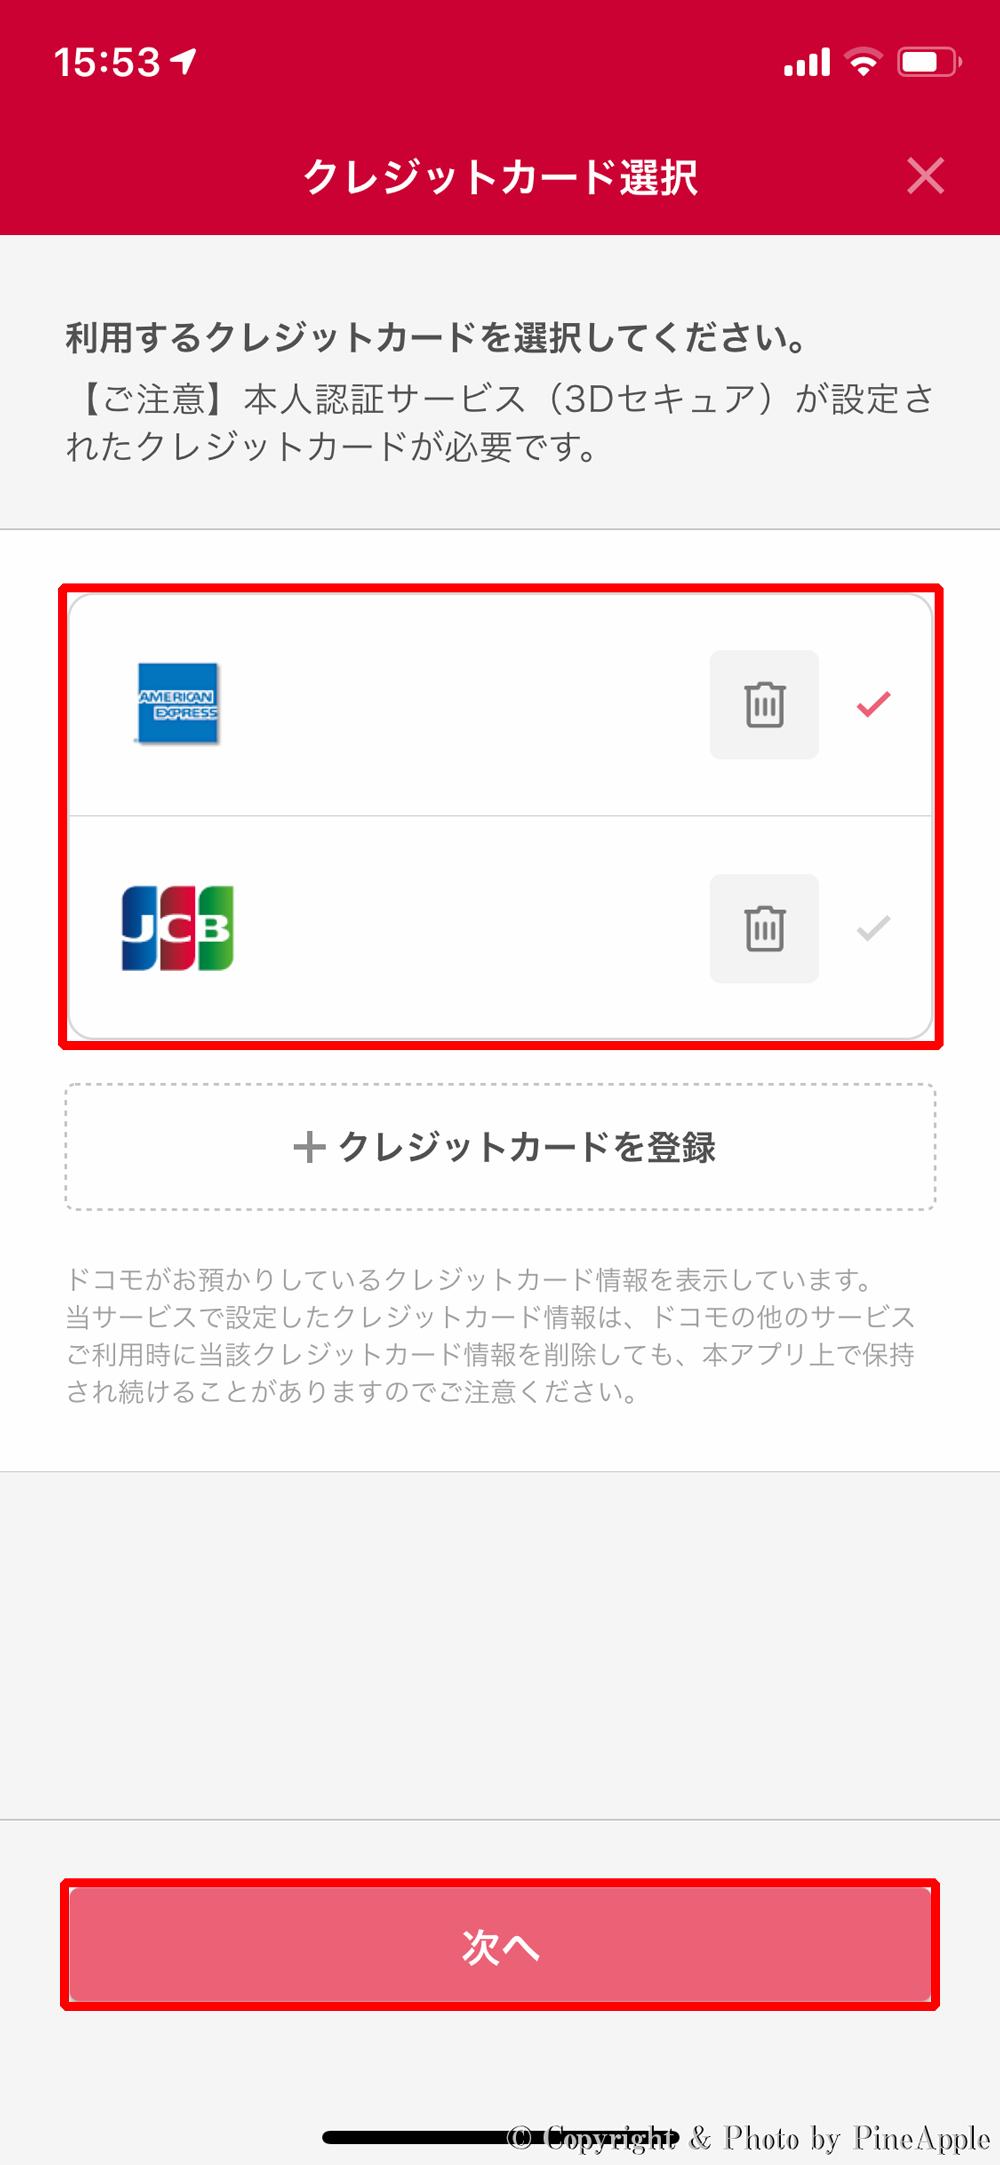 d 払い:「ゴミ箱」の右横にある「チェックマーク」を選択し、「次へ」をタップすることで、クレジットカードを切り替え